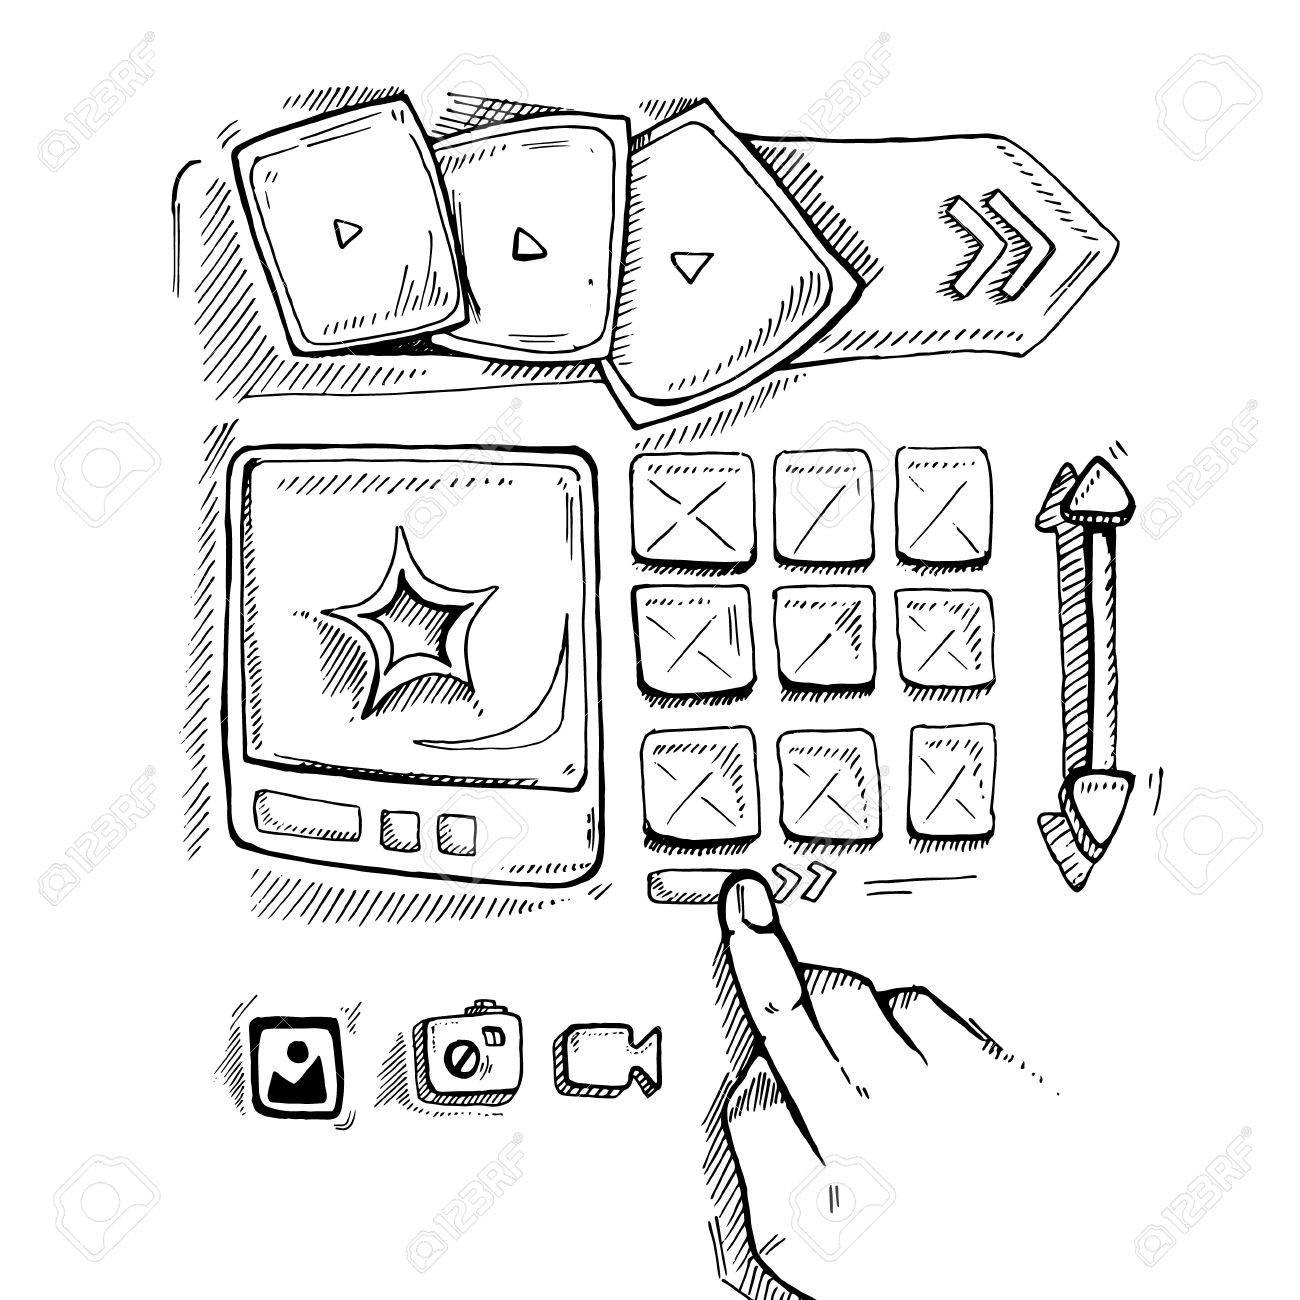 1300x1300 Wireframe Ui Kit. Web Design Portfolio Sketch Elements. Hand